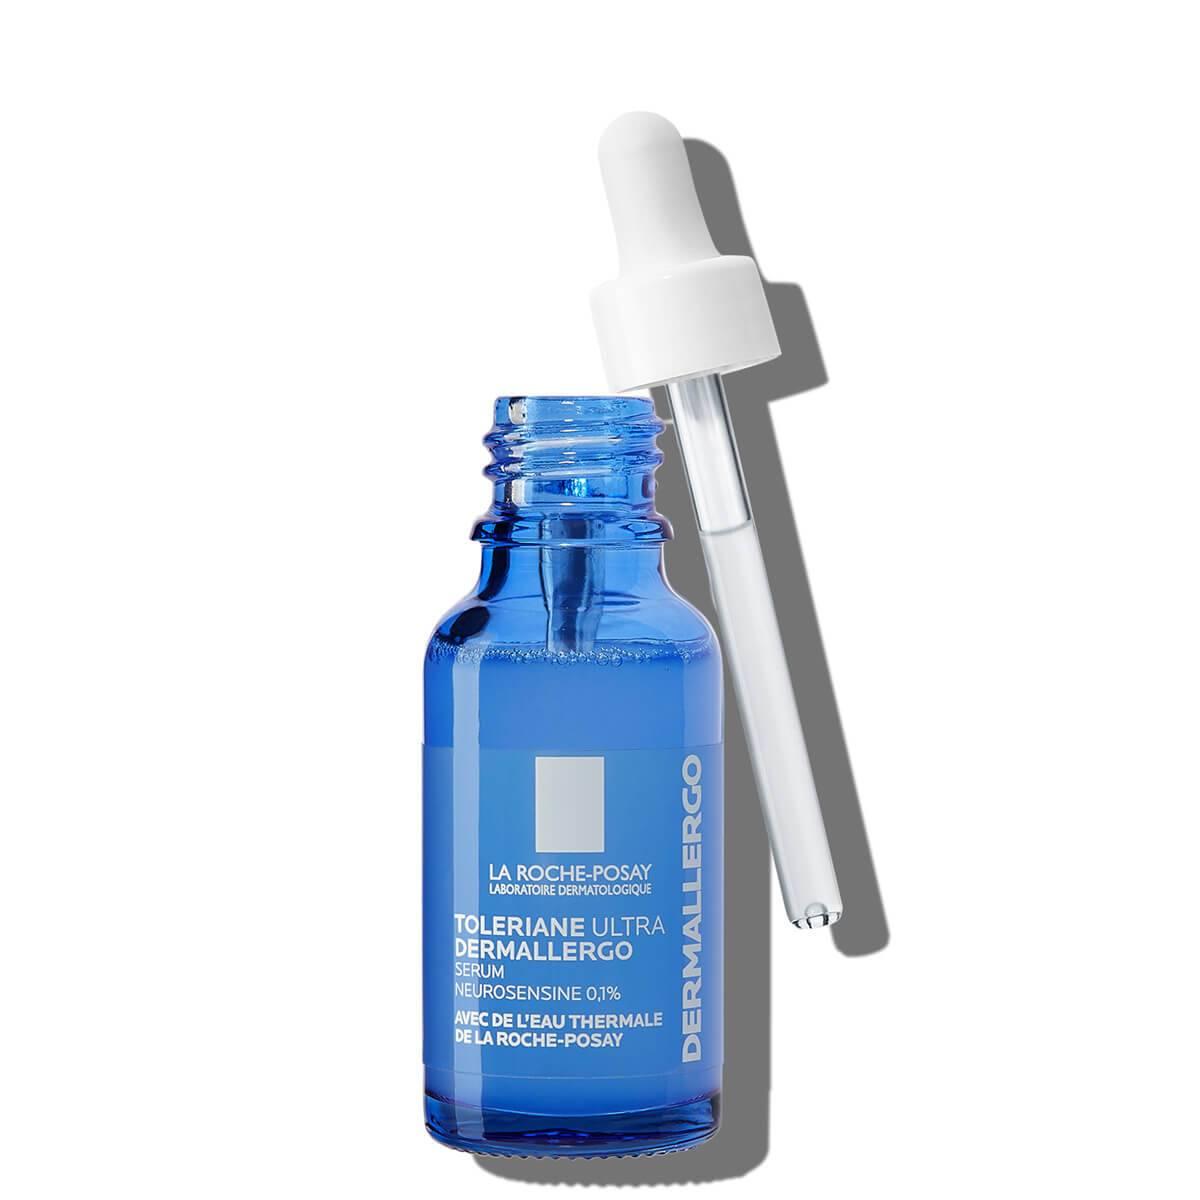 LaRochePosay-Produkt-Allergisk-Tolerian-UltraDermallergo-20ml-3337875693820-OpenSS-1